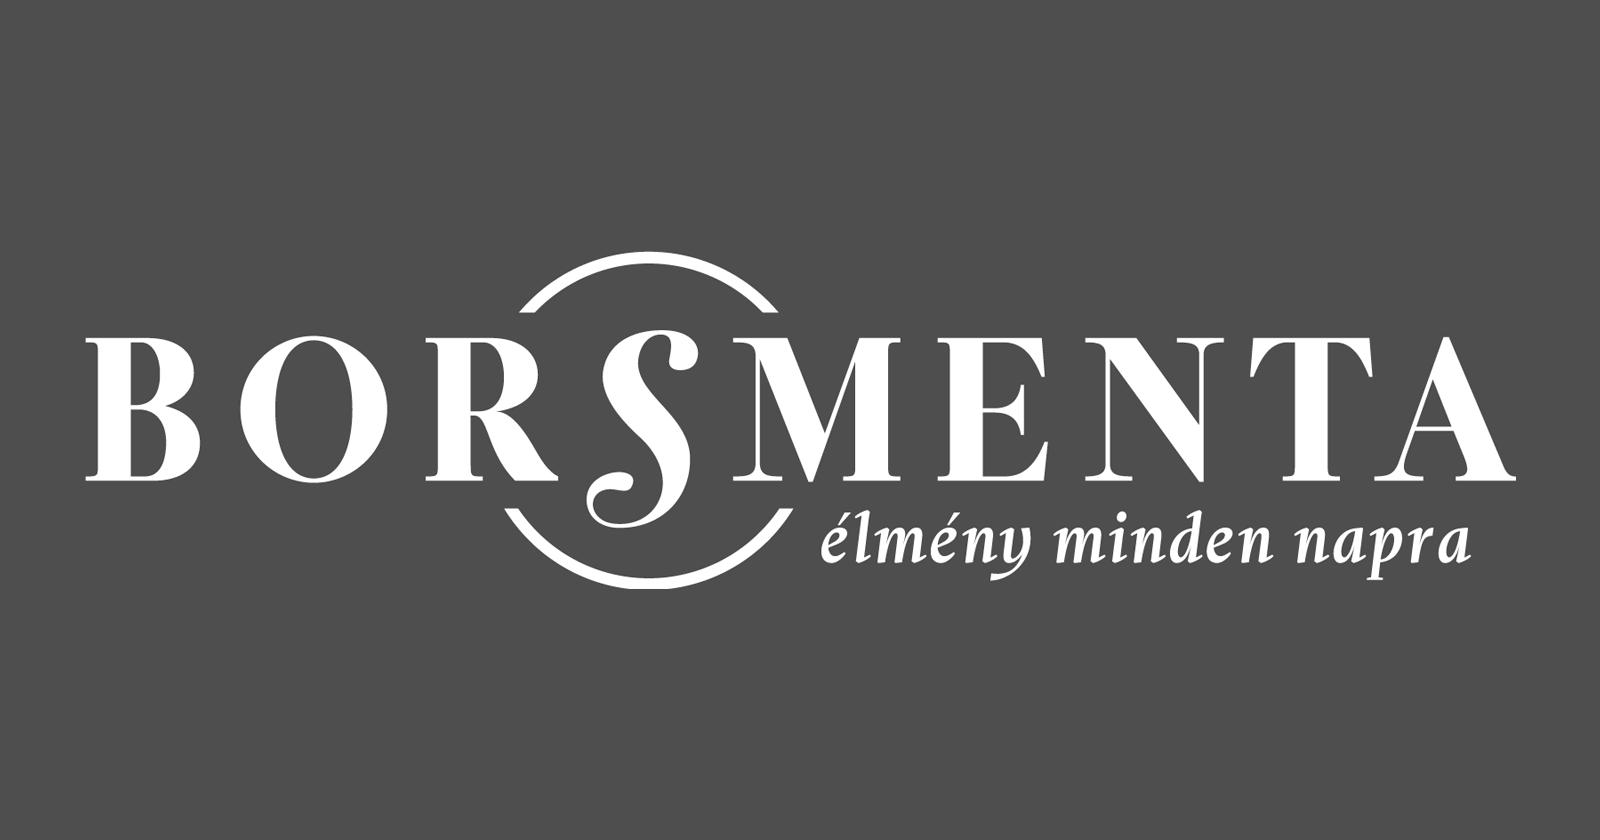 borsmenta-logo.png